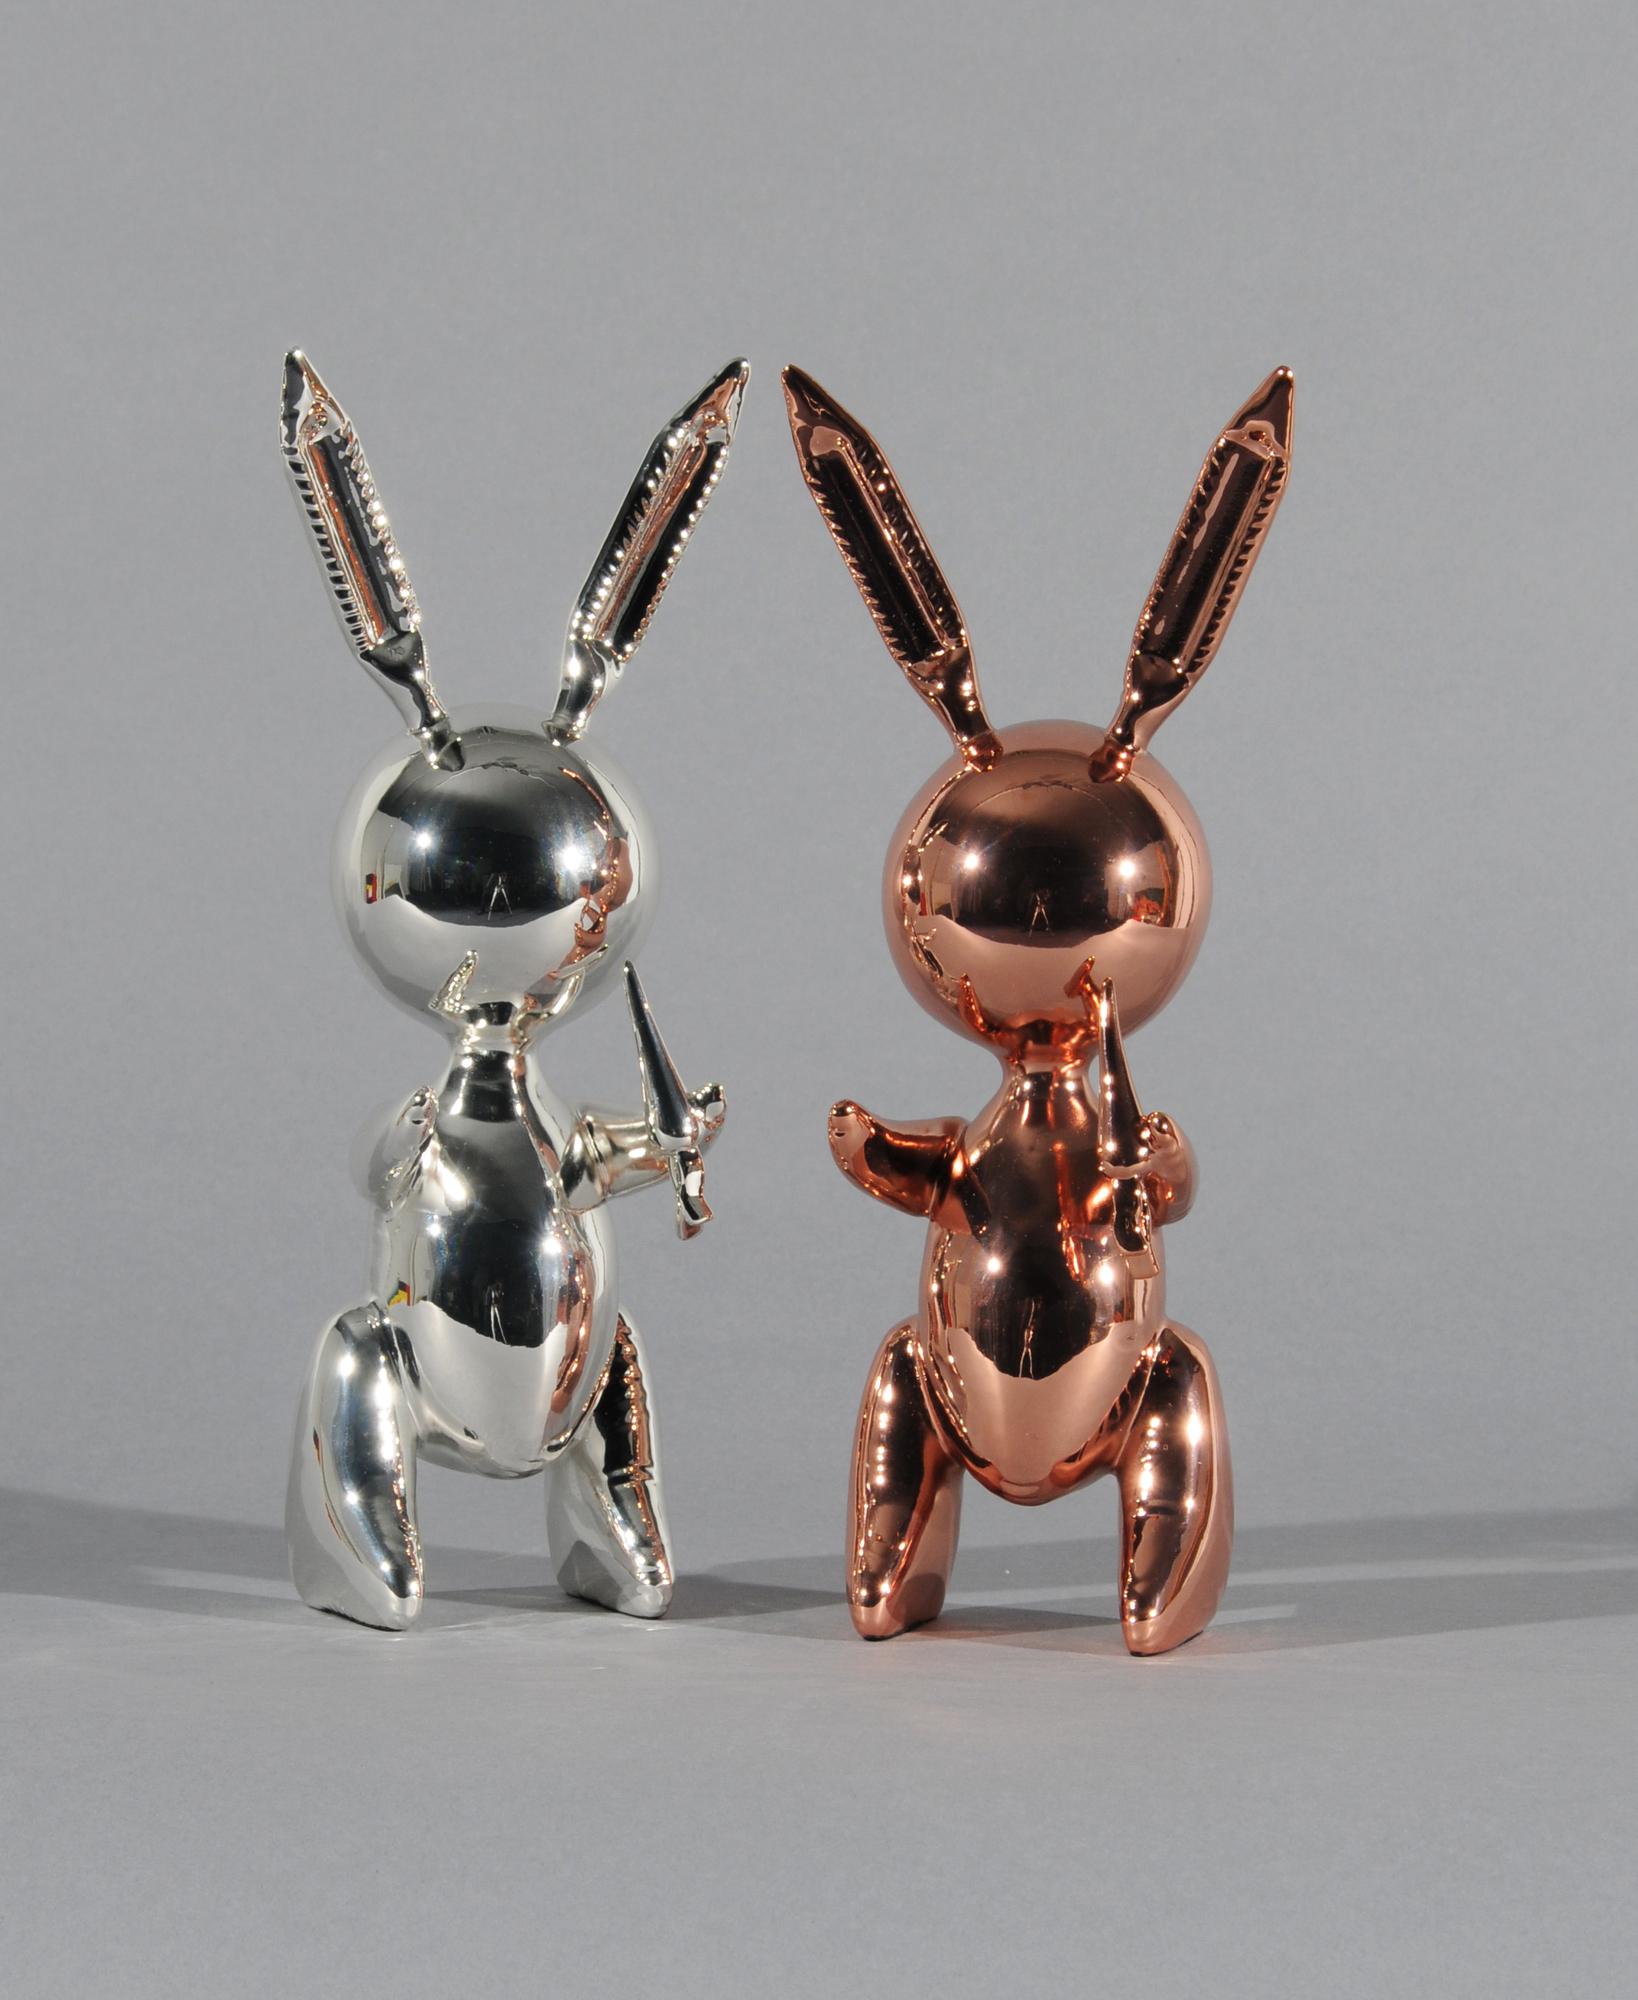 Koons Jeff, after. Set of 2 Rabbits: Rabbit (Rosé Gold); Rabbit (Silver)